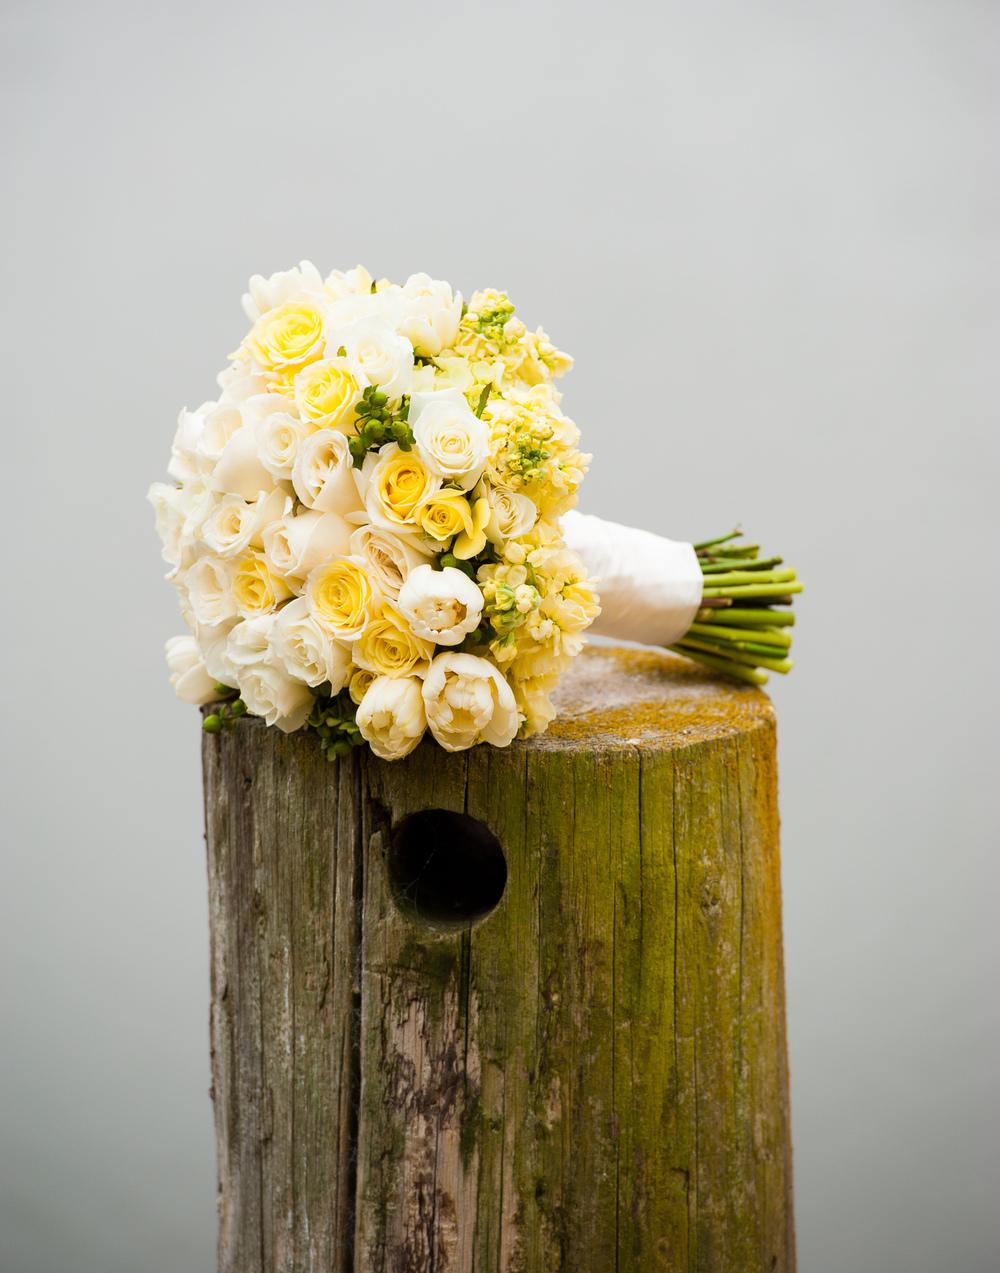 stewart_bertrand_wedding_photography_sdsw13-1013.jpg